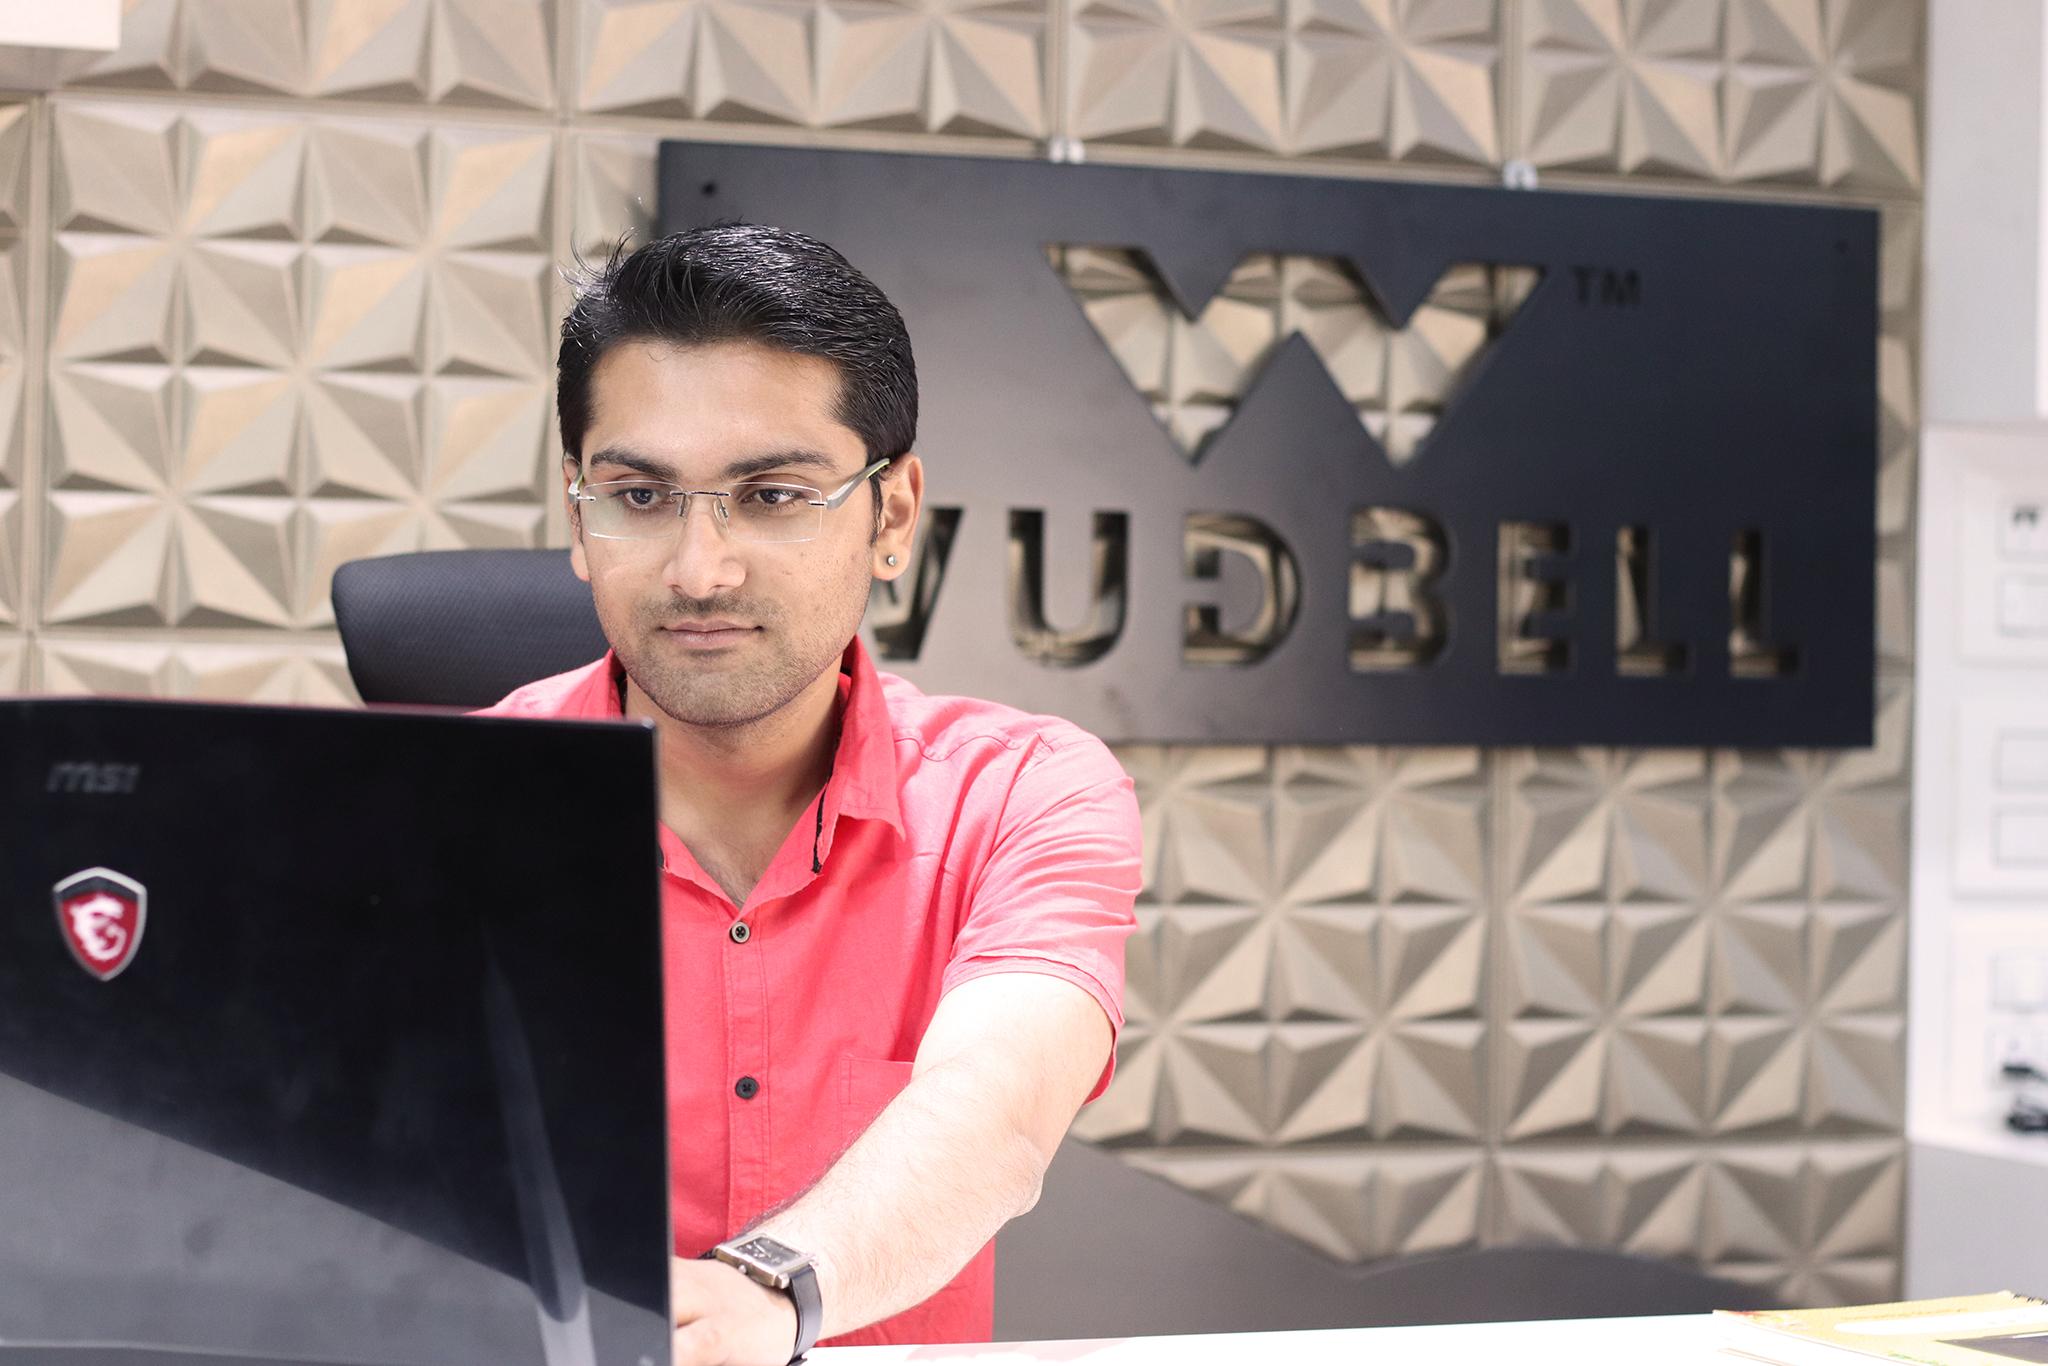 https://wudbell.com/wp-content/uploads/2020/01/Maroj-Patel-1280x854.jpg